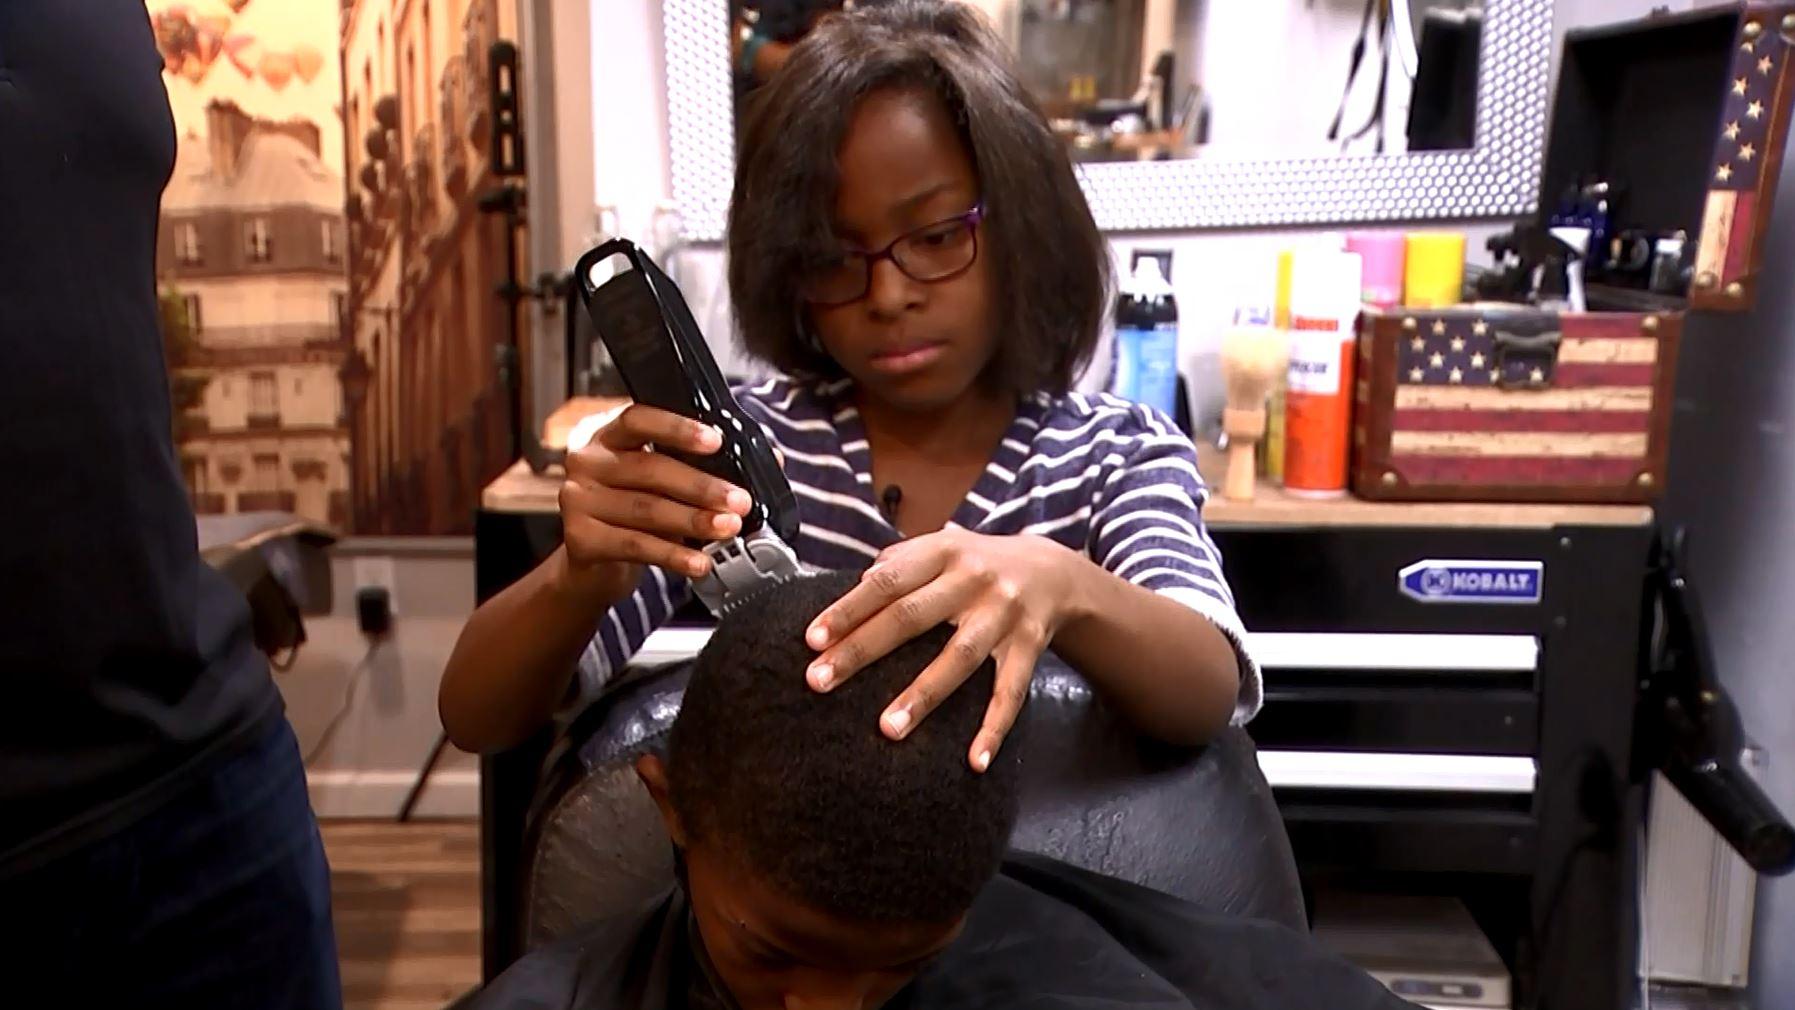 8-year-old girl becomes barber, gives free haircuts to neighborhood kids